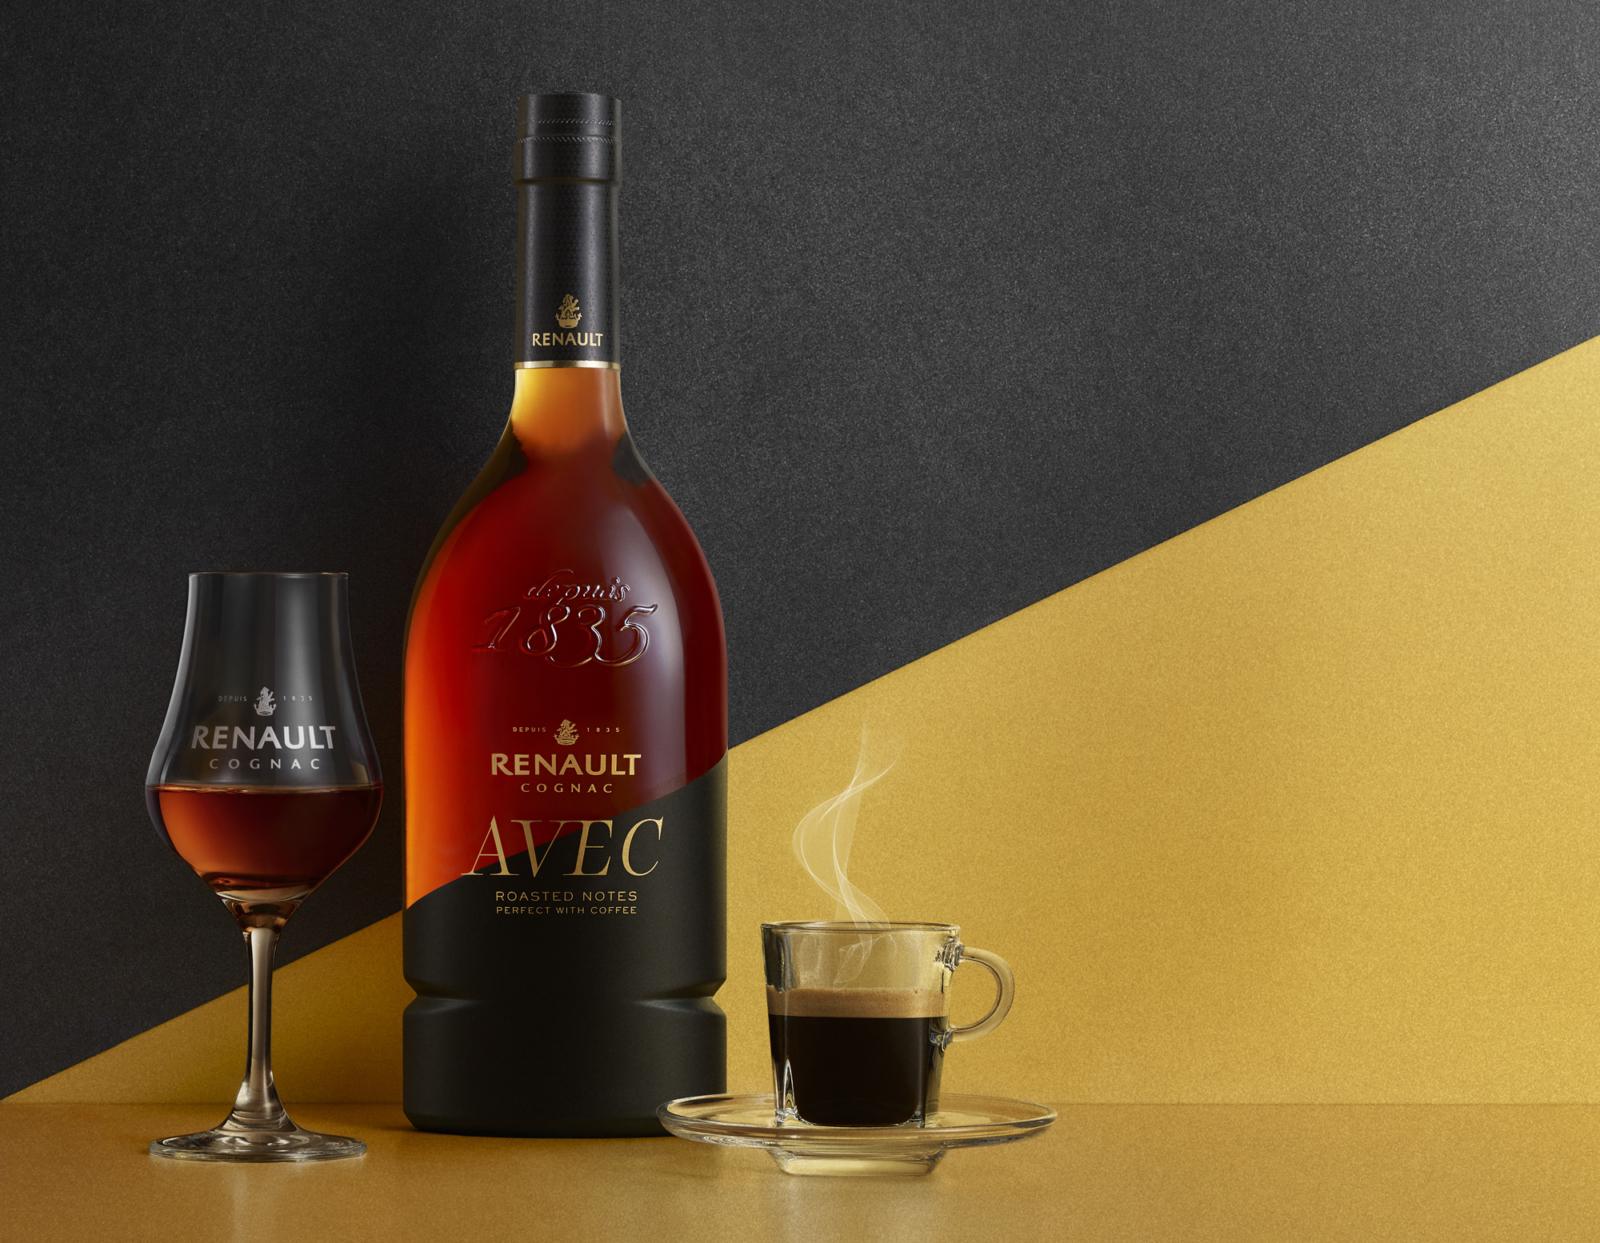 Renault Cognac AVEC